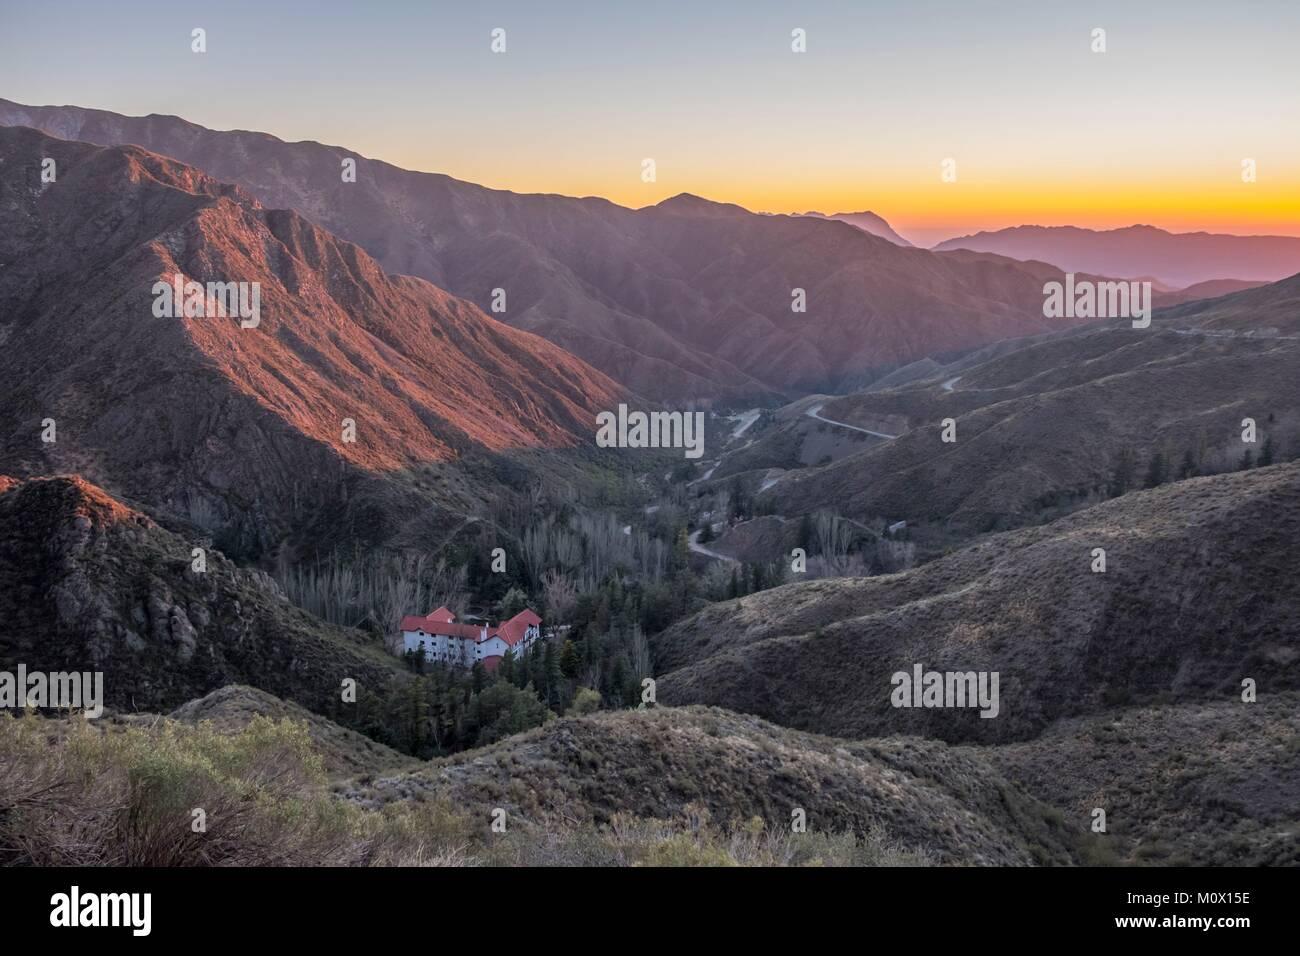 L'Argentine, la Province de Mendoza, Villavicencio Villavicencio en route,Nature Preserve Photo Stock